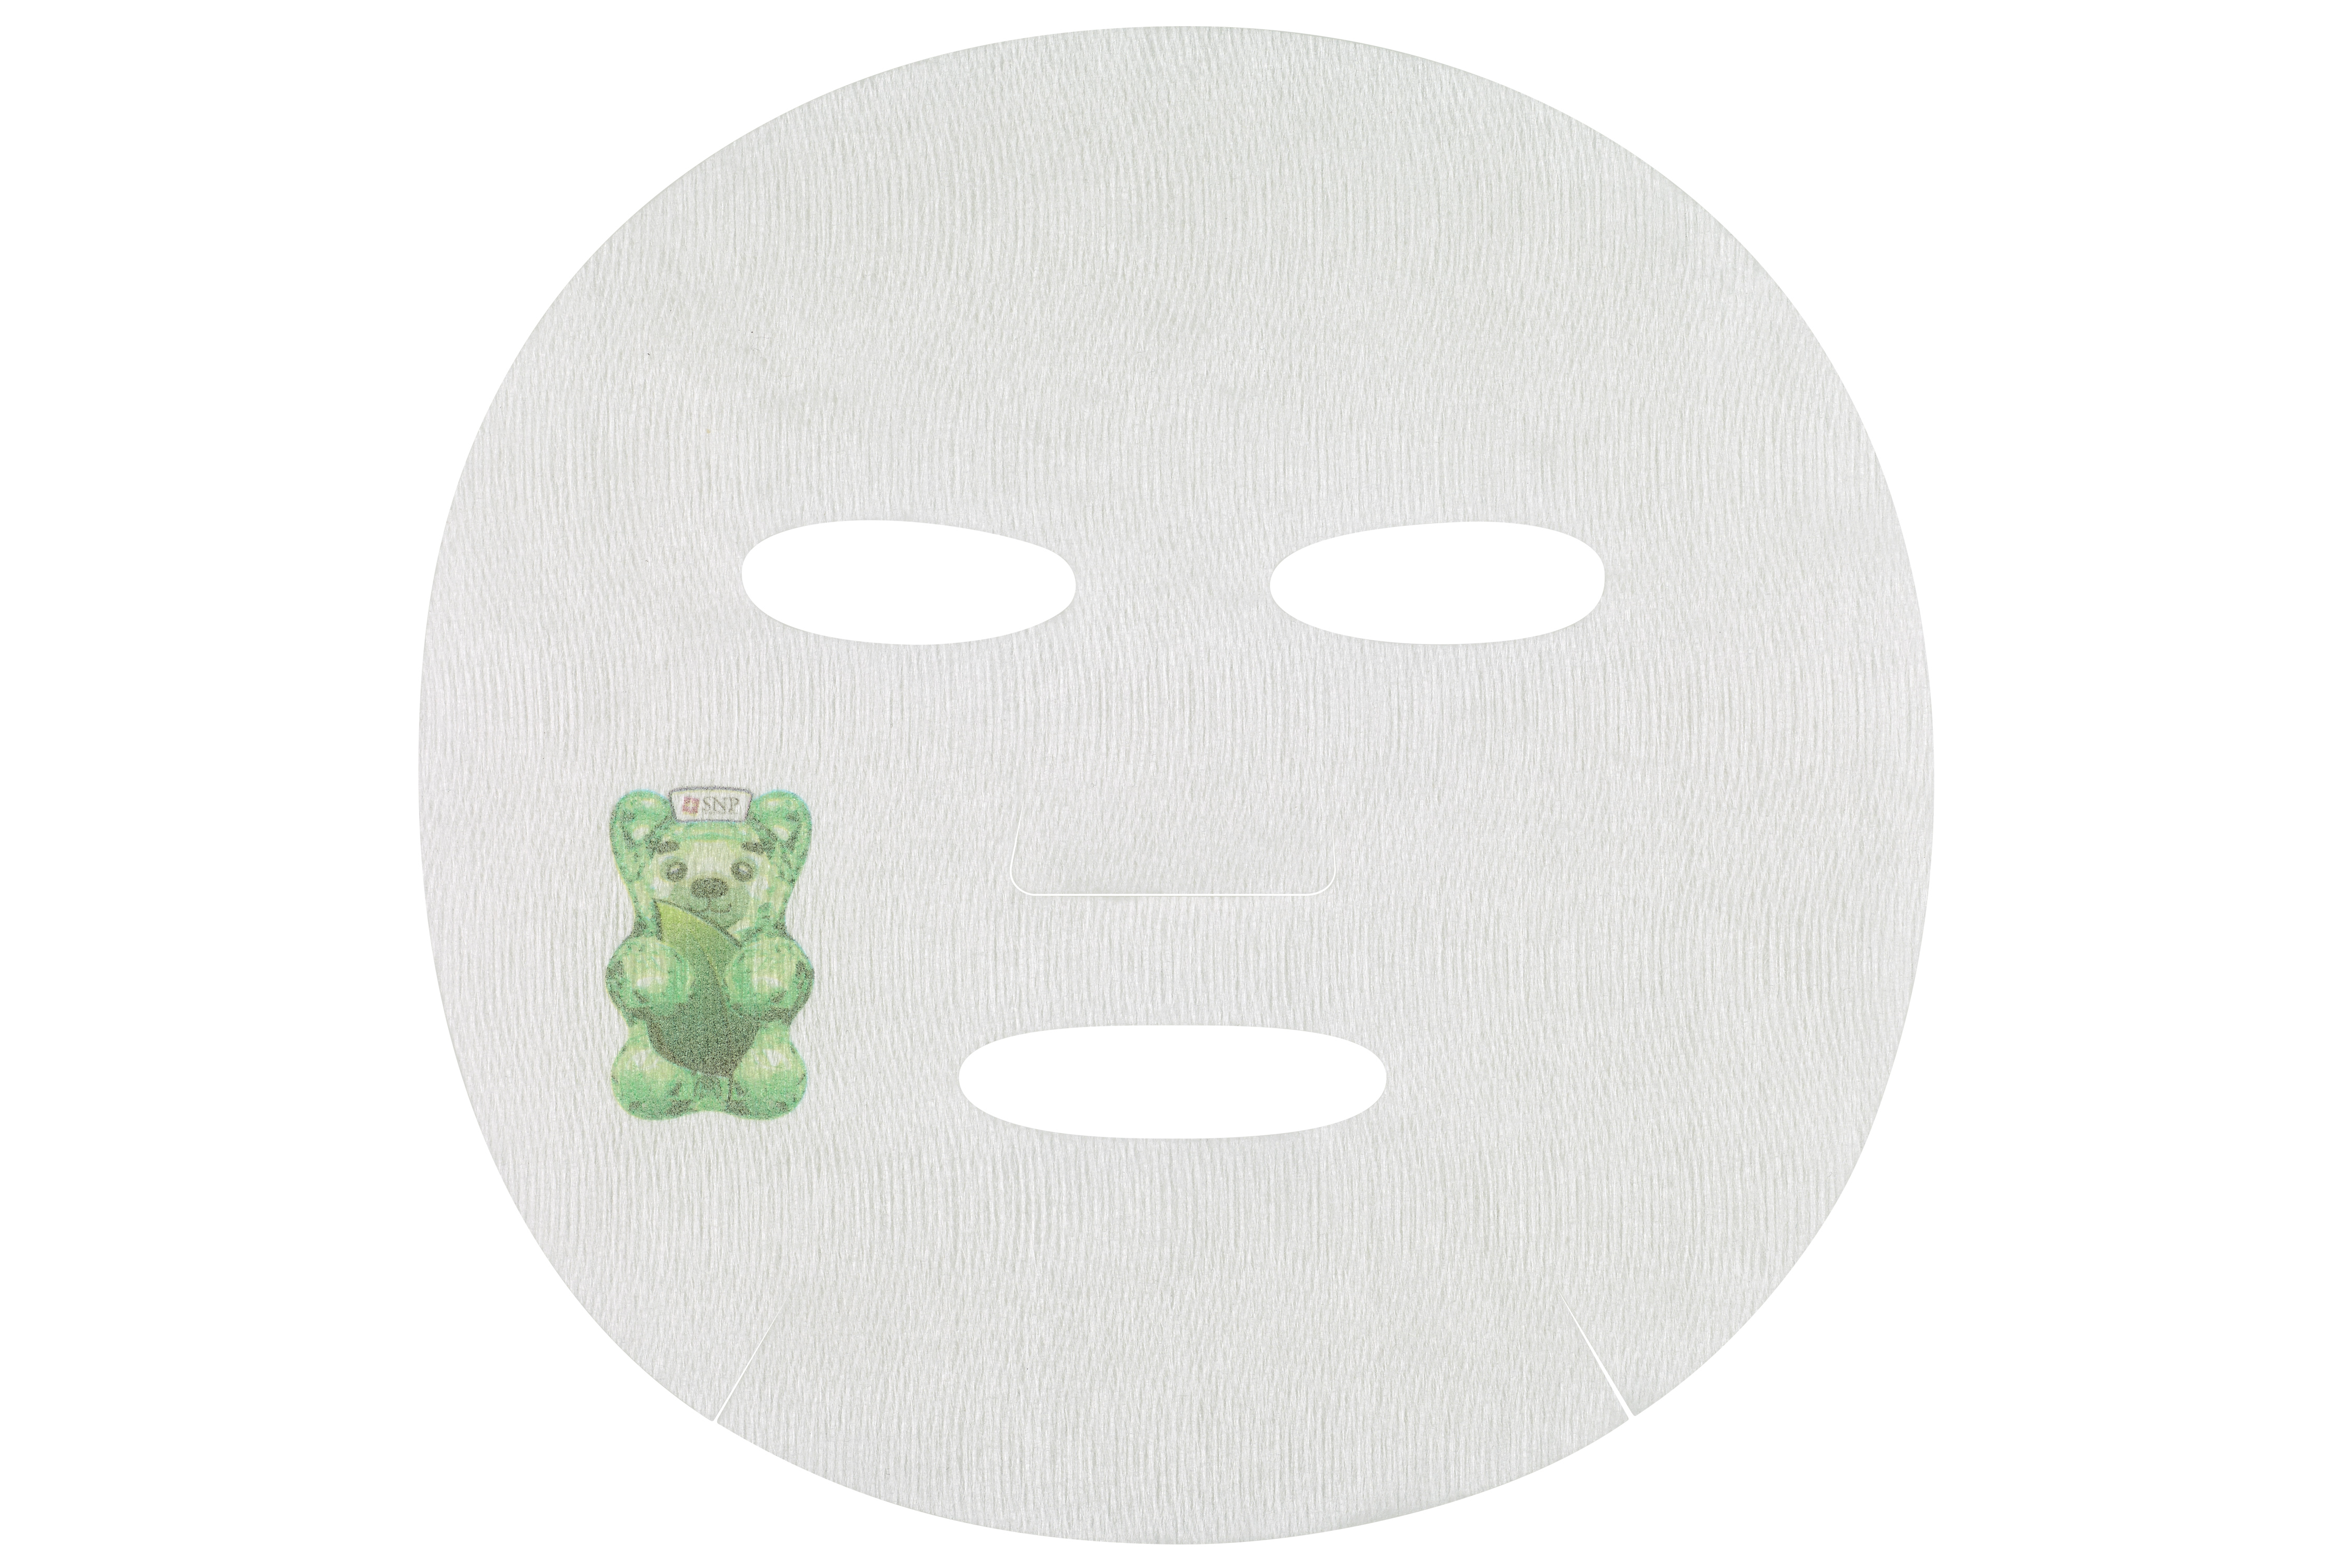 https://mlyufgl3mb4o.i.optimole.com/hdRuOSc.zvht~1284/w:600/h:400/q:90/https://www.bolehshop.id/wp-content/uploads/2020/06/SNP-Ice-Bear-Cica-Mask_sheet.jpg